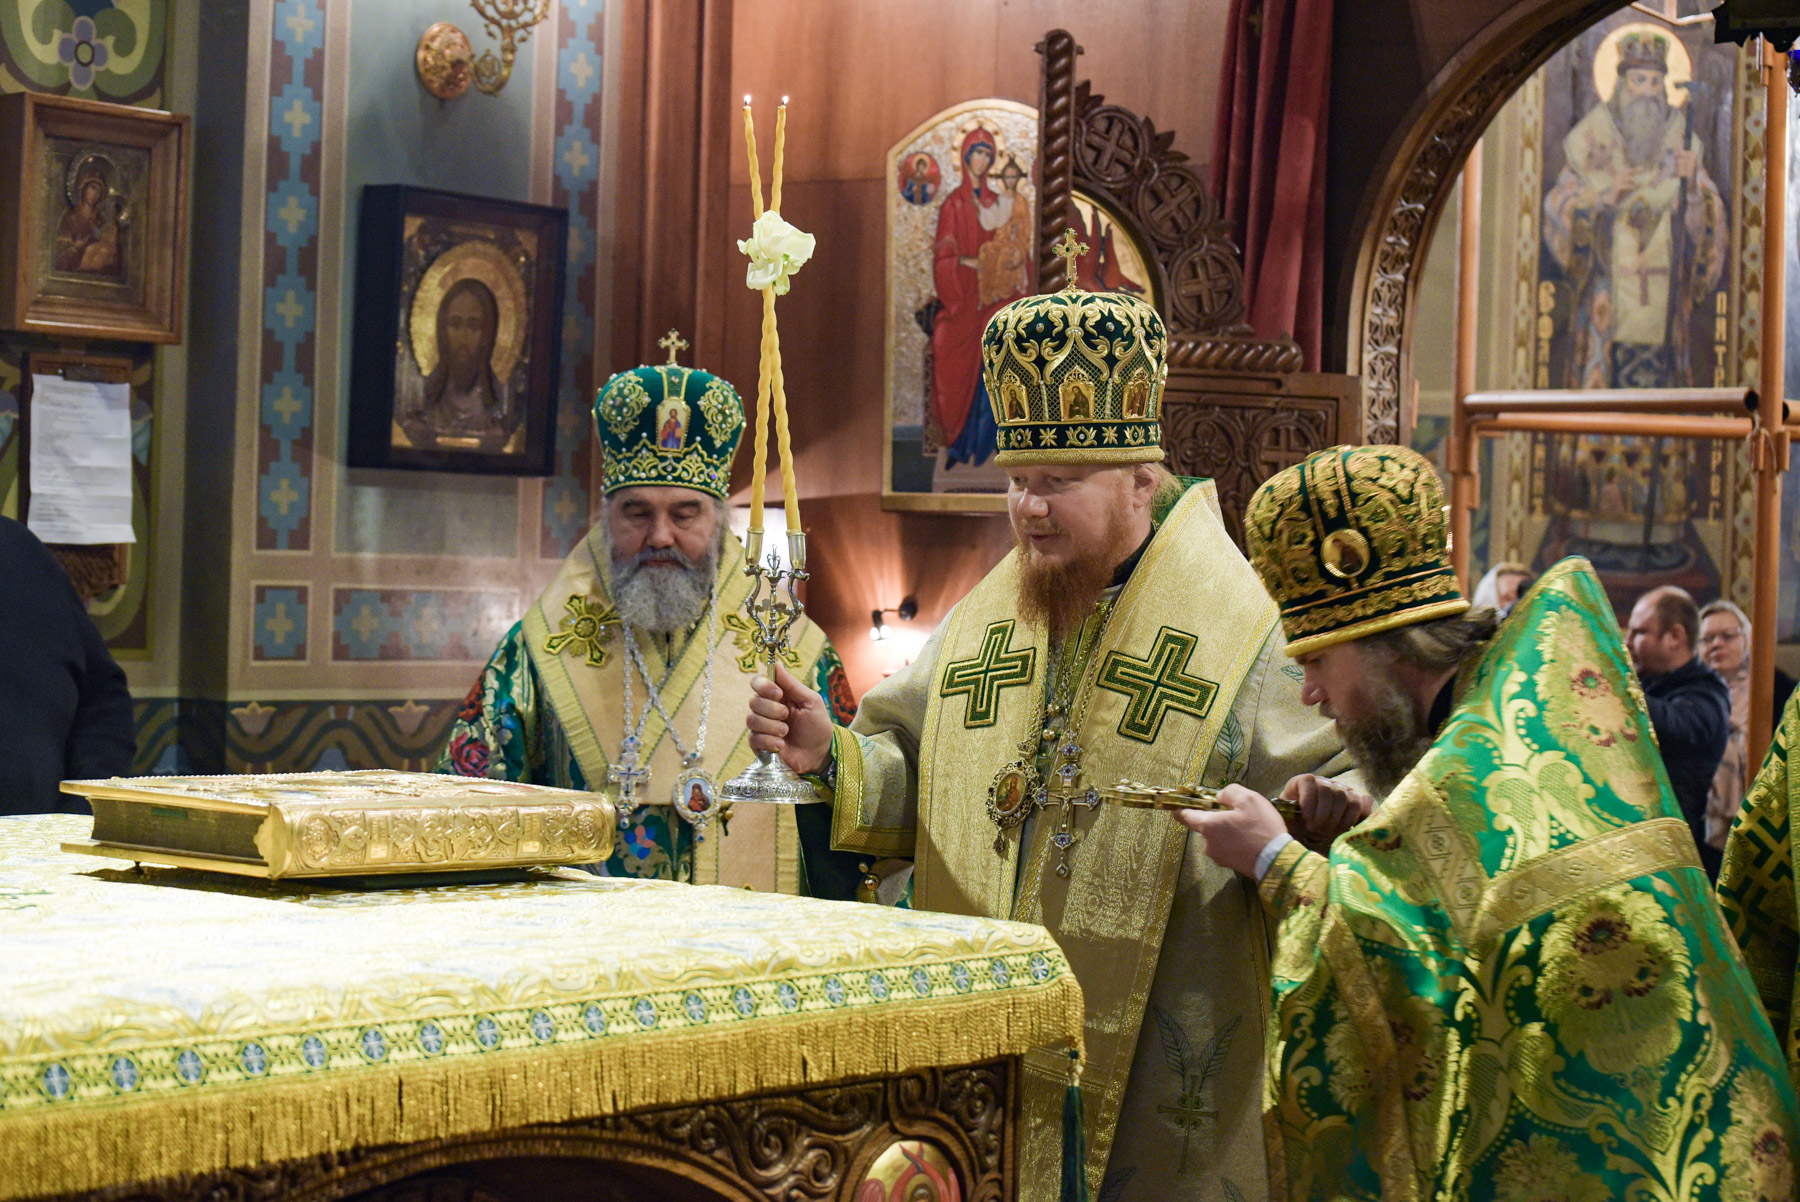 photos of orthodox christmas 0119 2